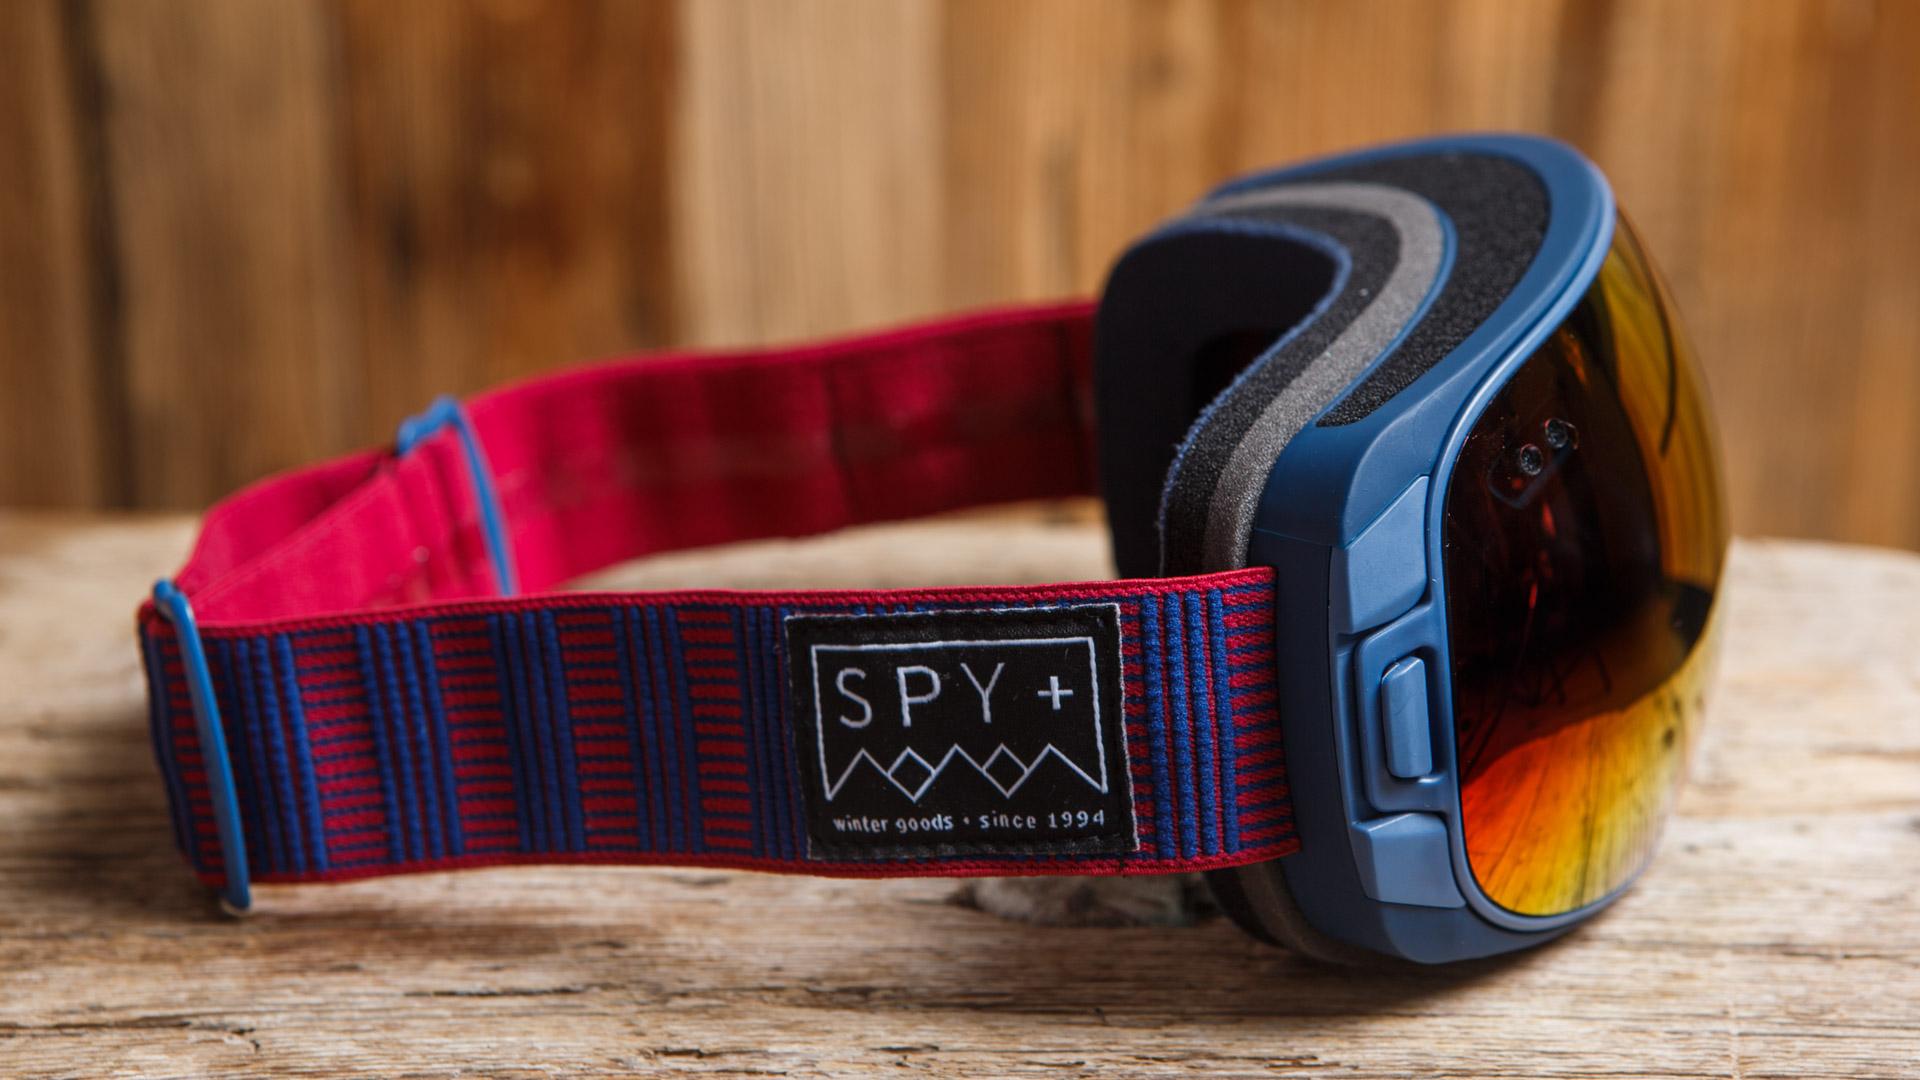 Spy Doom 2016 2017 Snowboard Goggles Review